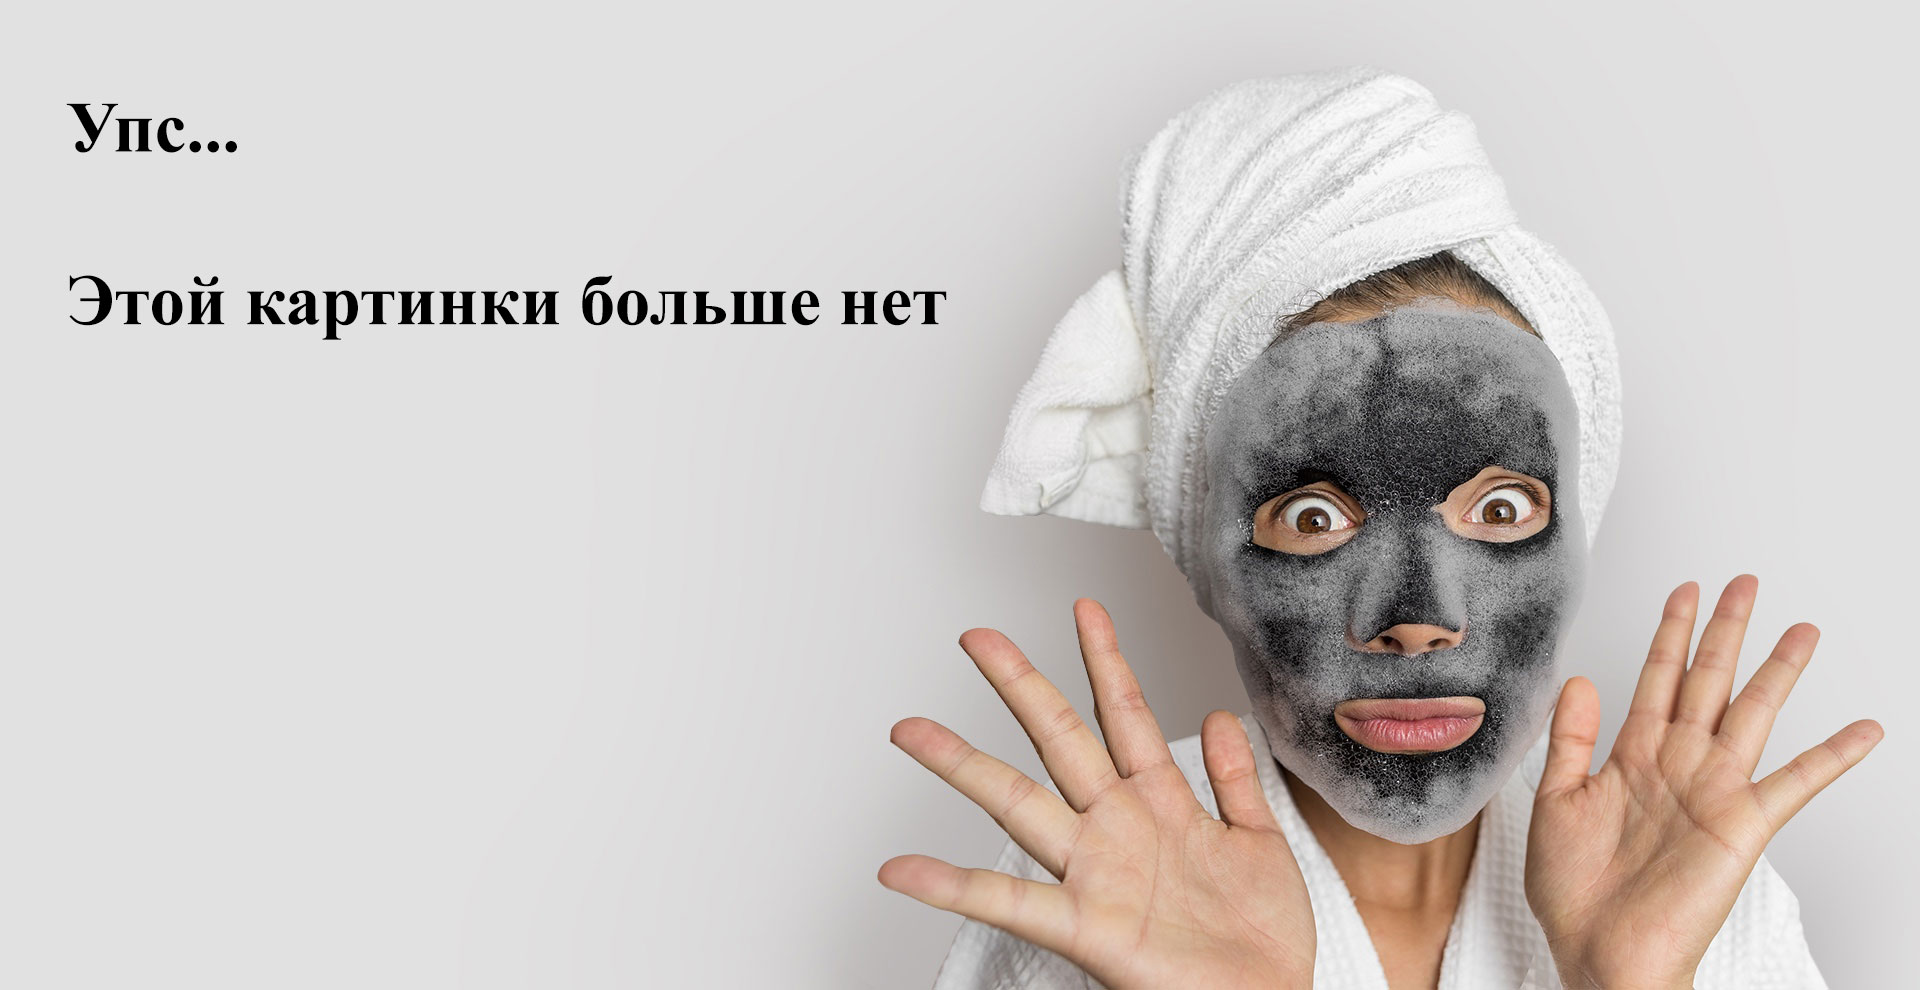 Dr.Koжevatkin, Энзимная пудра с экстрактом малины, 50 мл